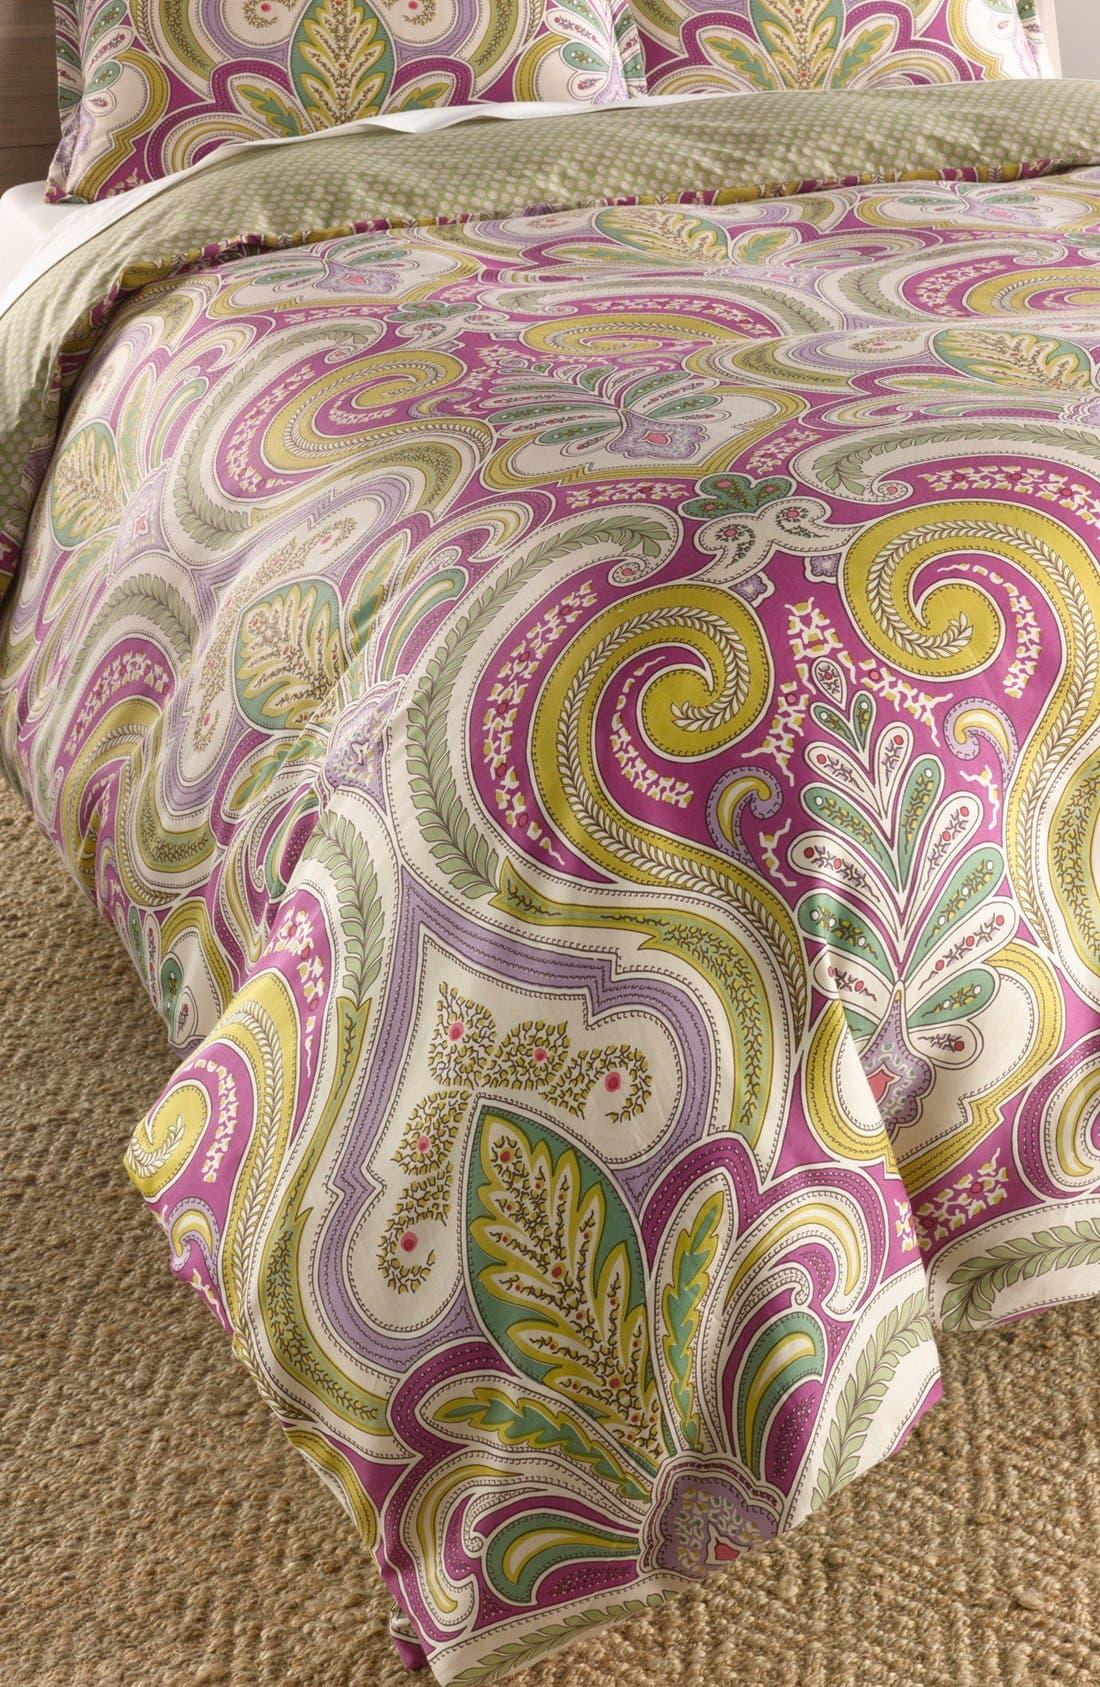 Main Image - Echo 'Vineyard' Duvet Cover